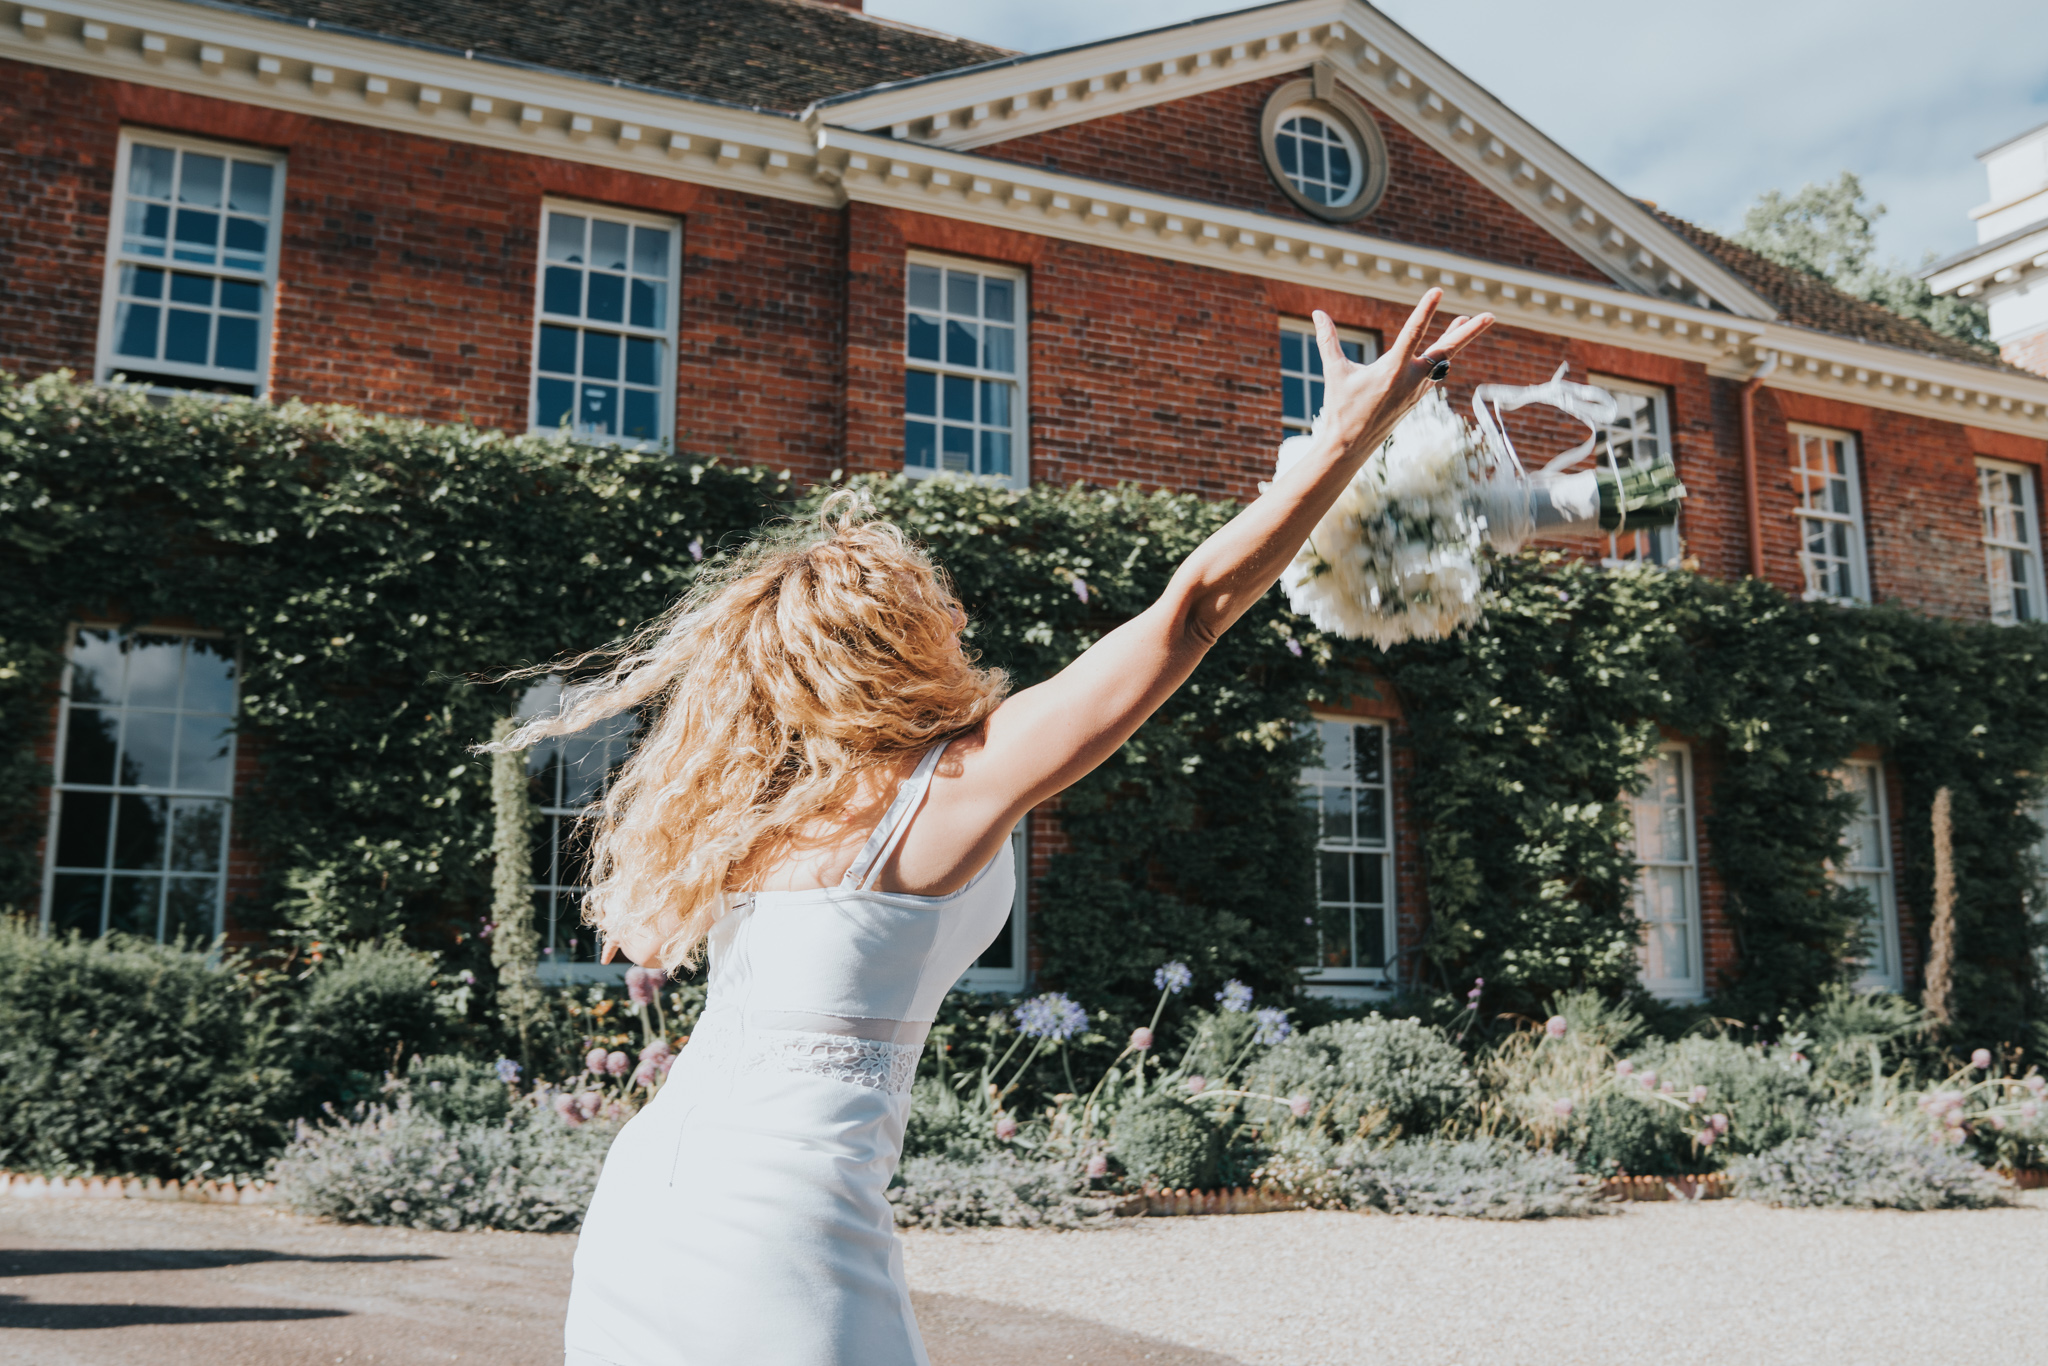 grace-elizabeth-boho-wedding-headingham-castle-essex-wedding-photographer-67.jpg